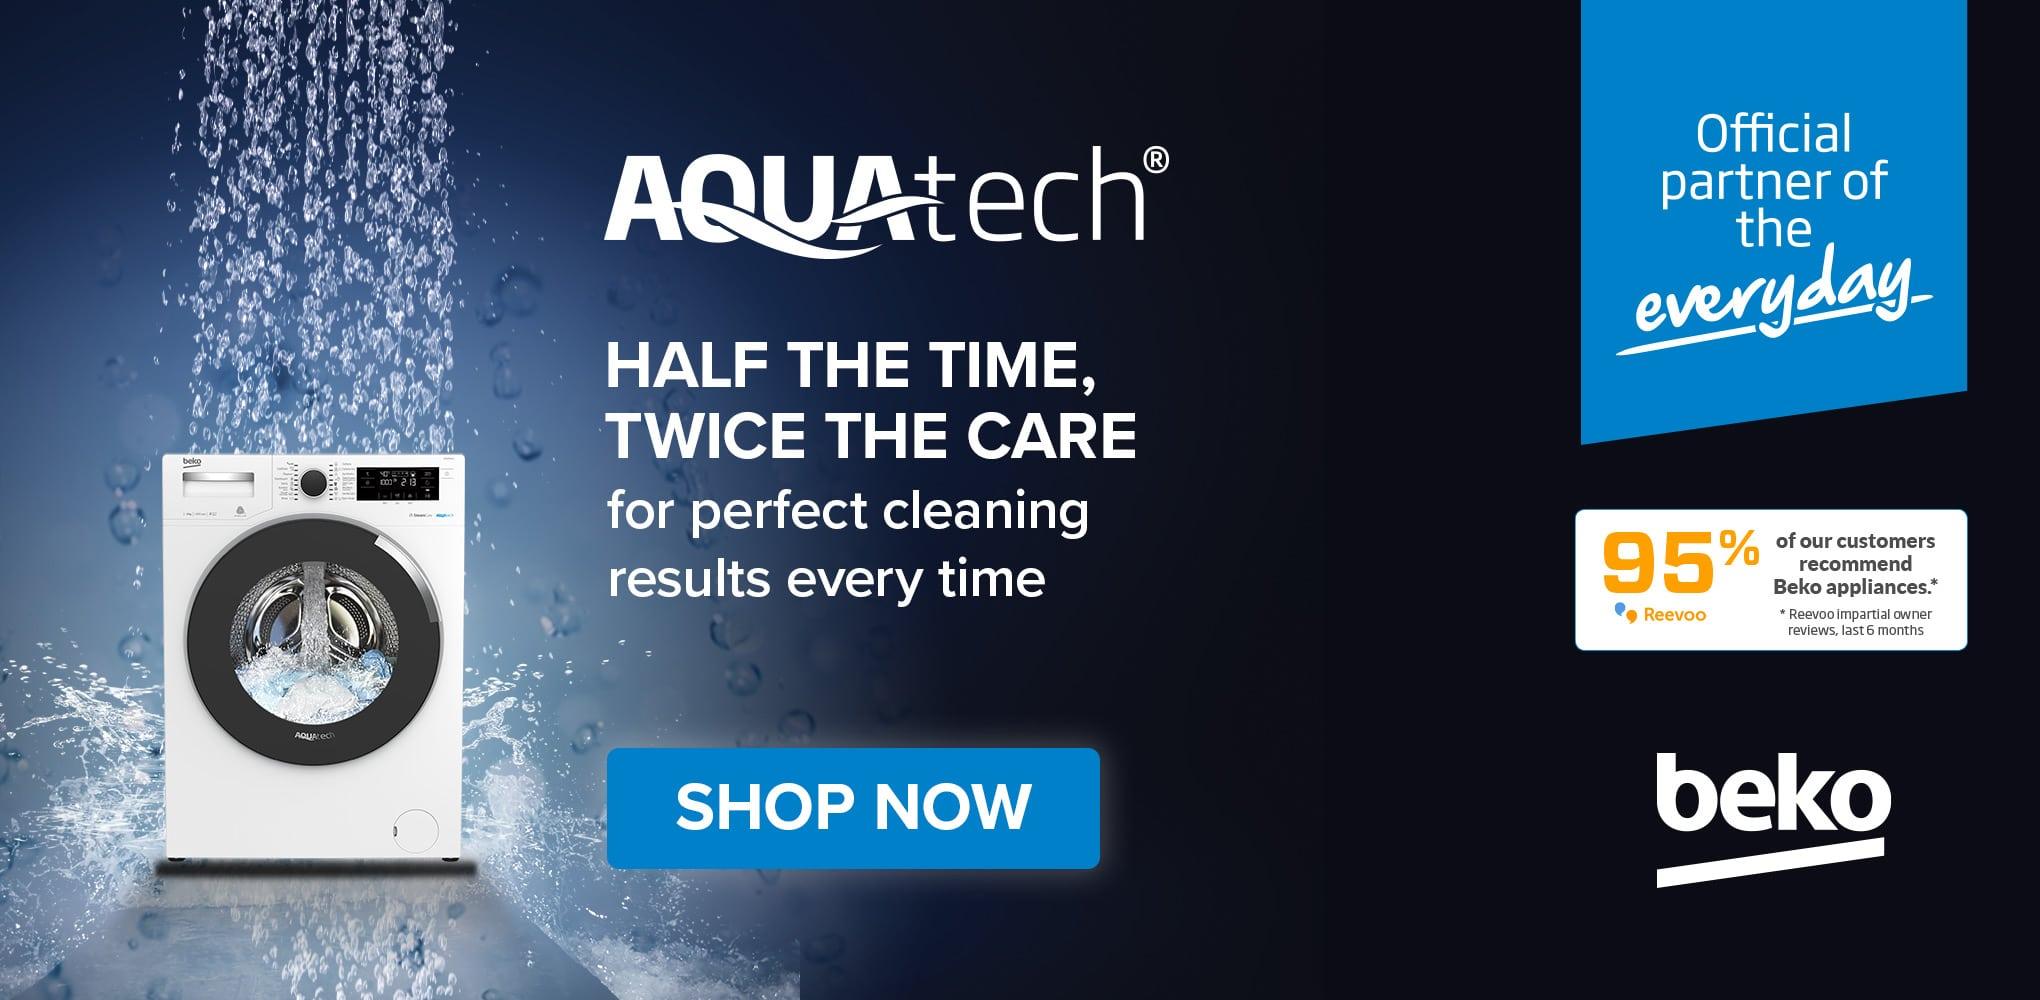 beko aquatech homepage mobile